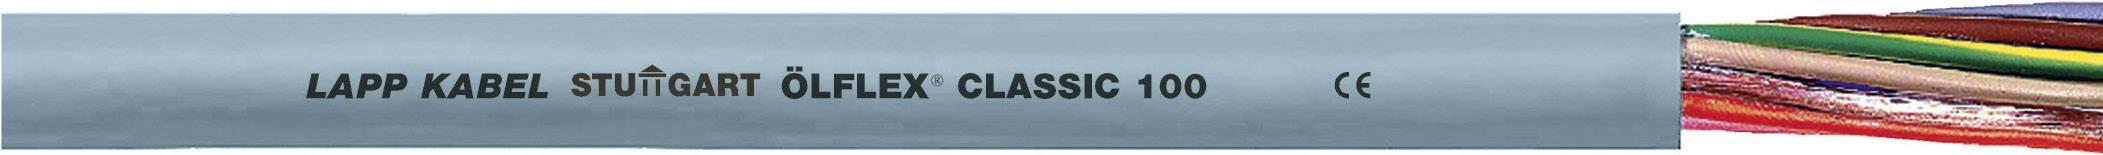 Kabel LappKabel Ölflex CLASSIC 100 12G1 (0010050), PVC, 10,5 mm, 500 V, šedá, 500 m